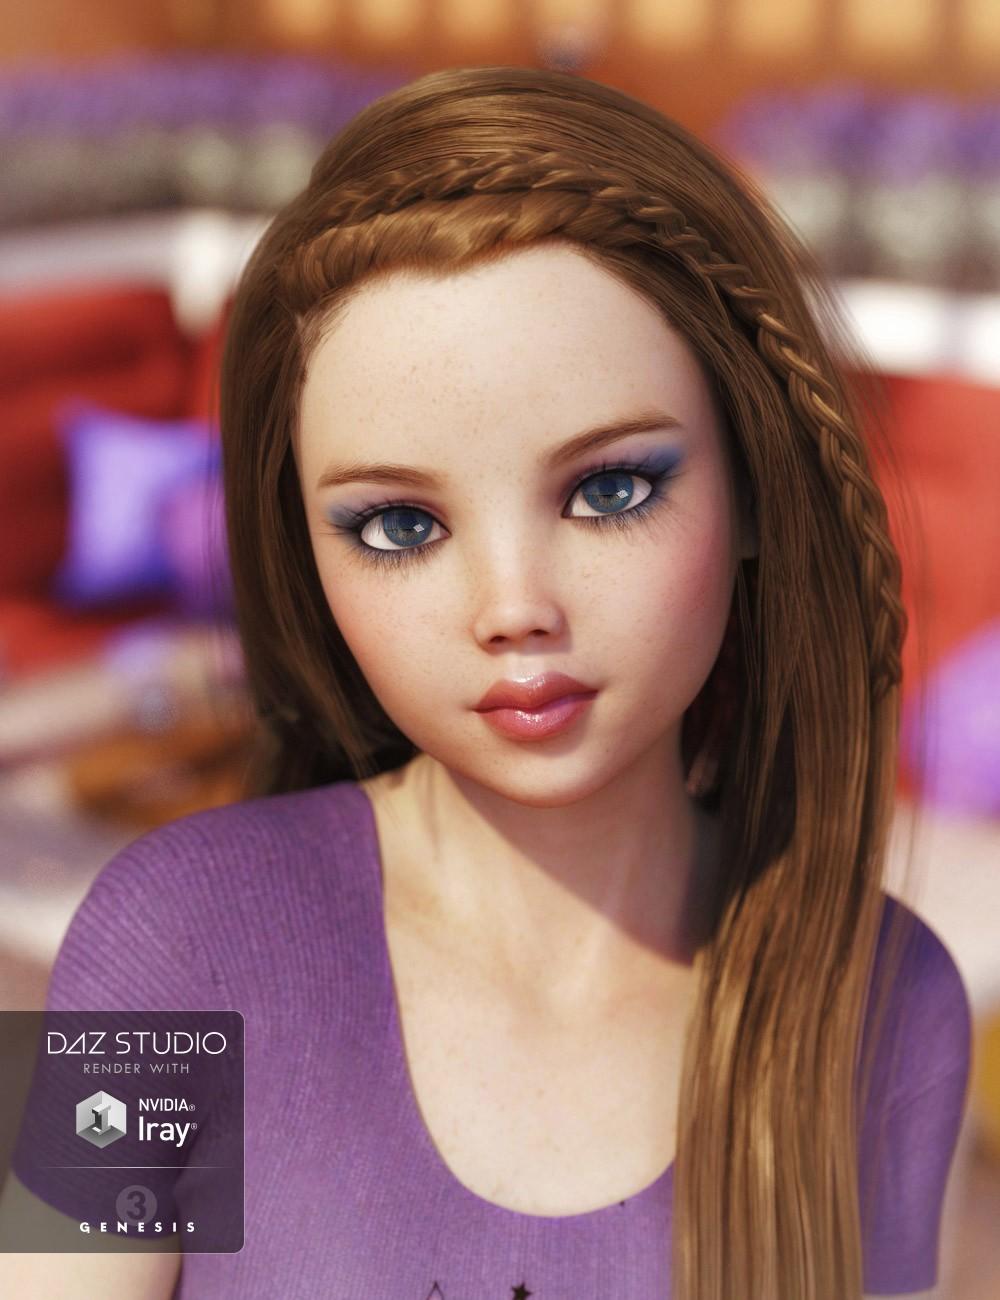 Download DAZ Studio 3 for FREE!: DAZ 3D - DA Sassy Poses